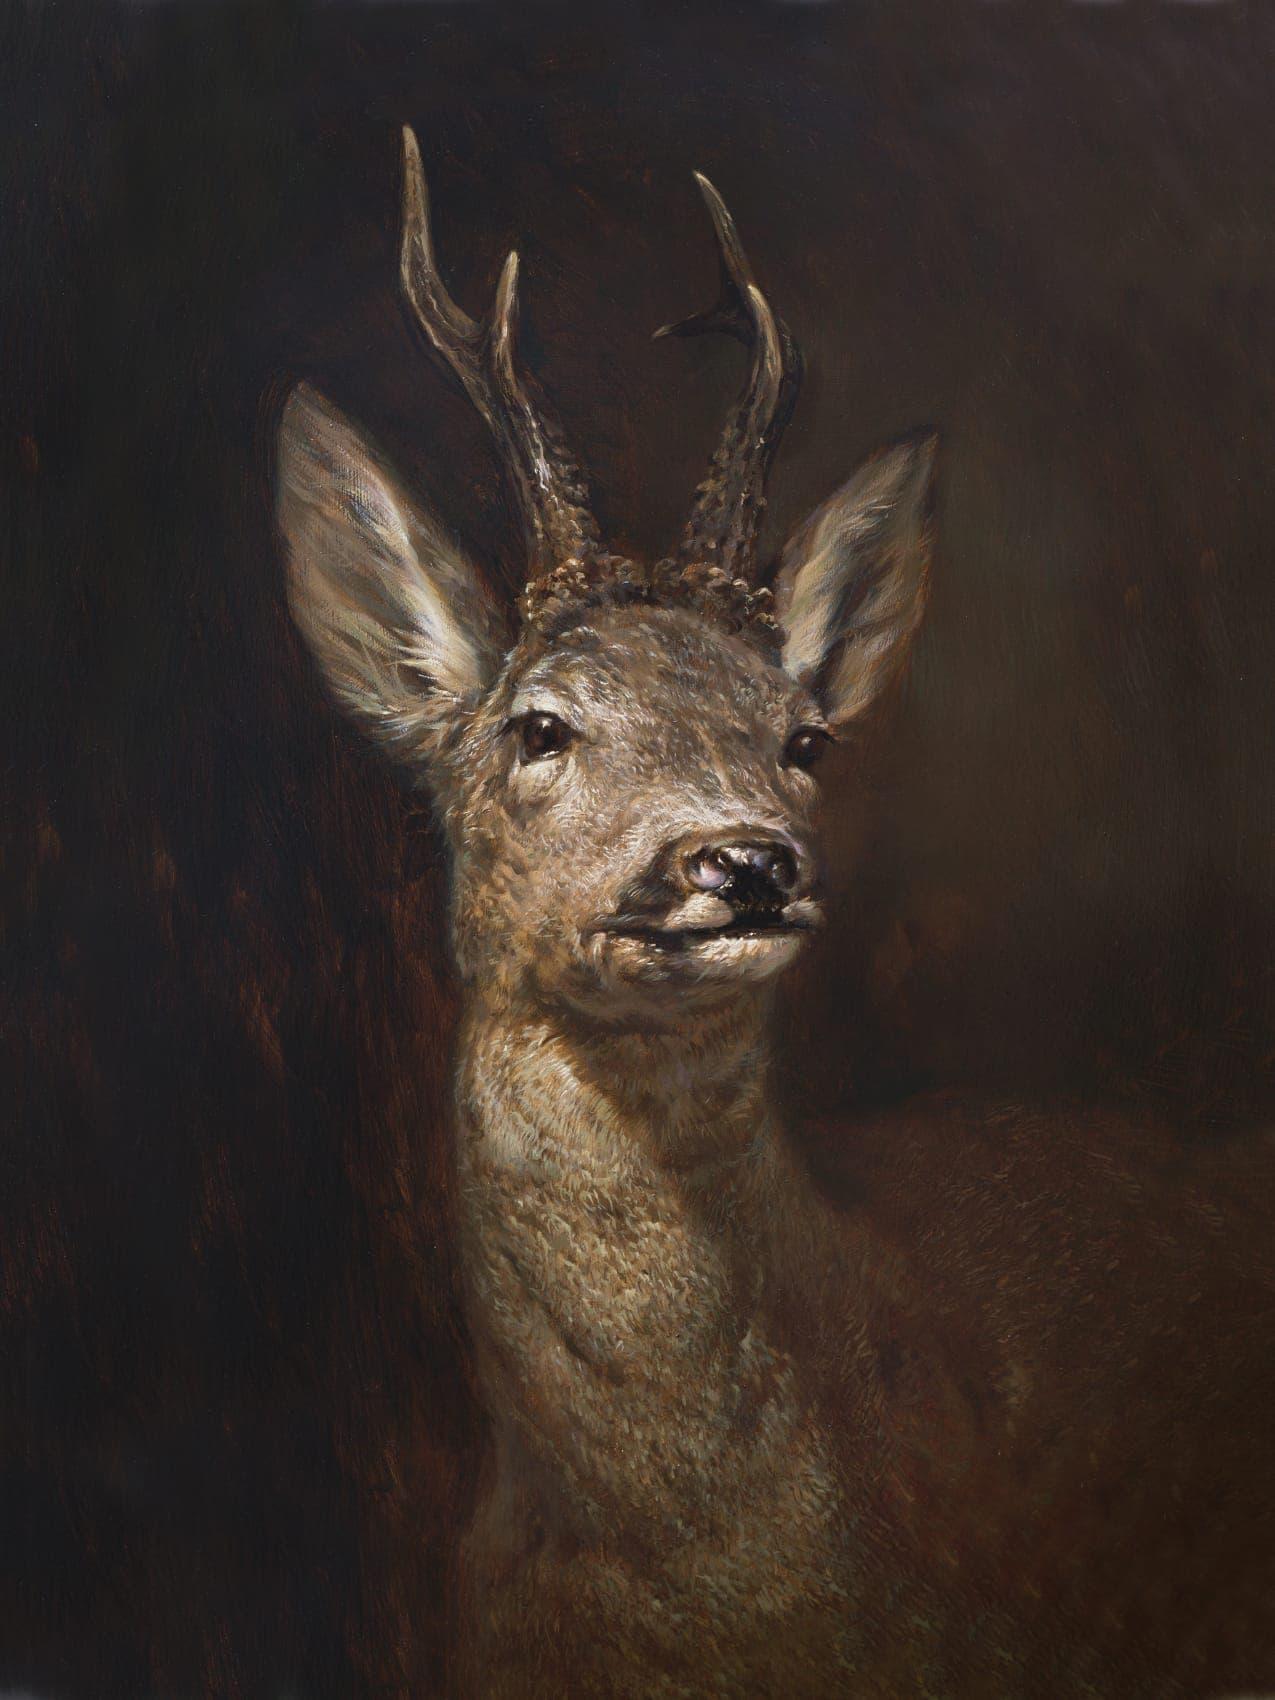 Roe Deer (capreolus capreolus) picture